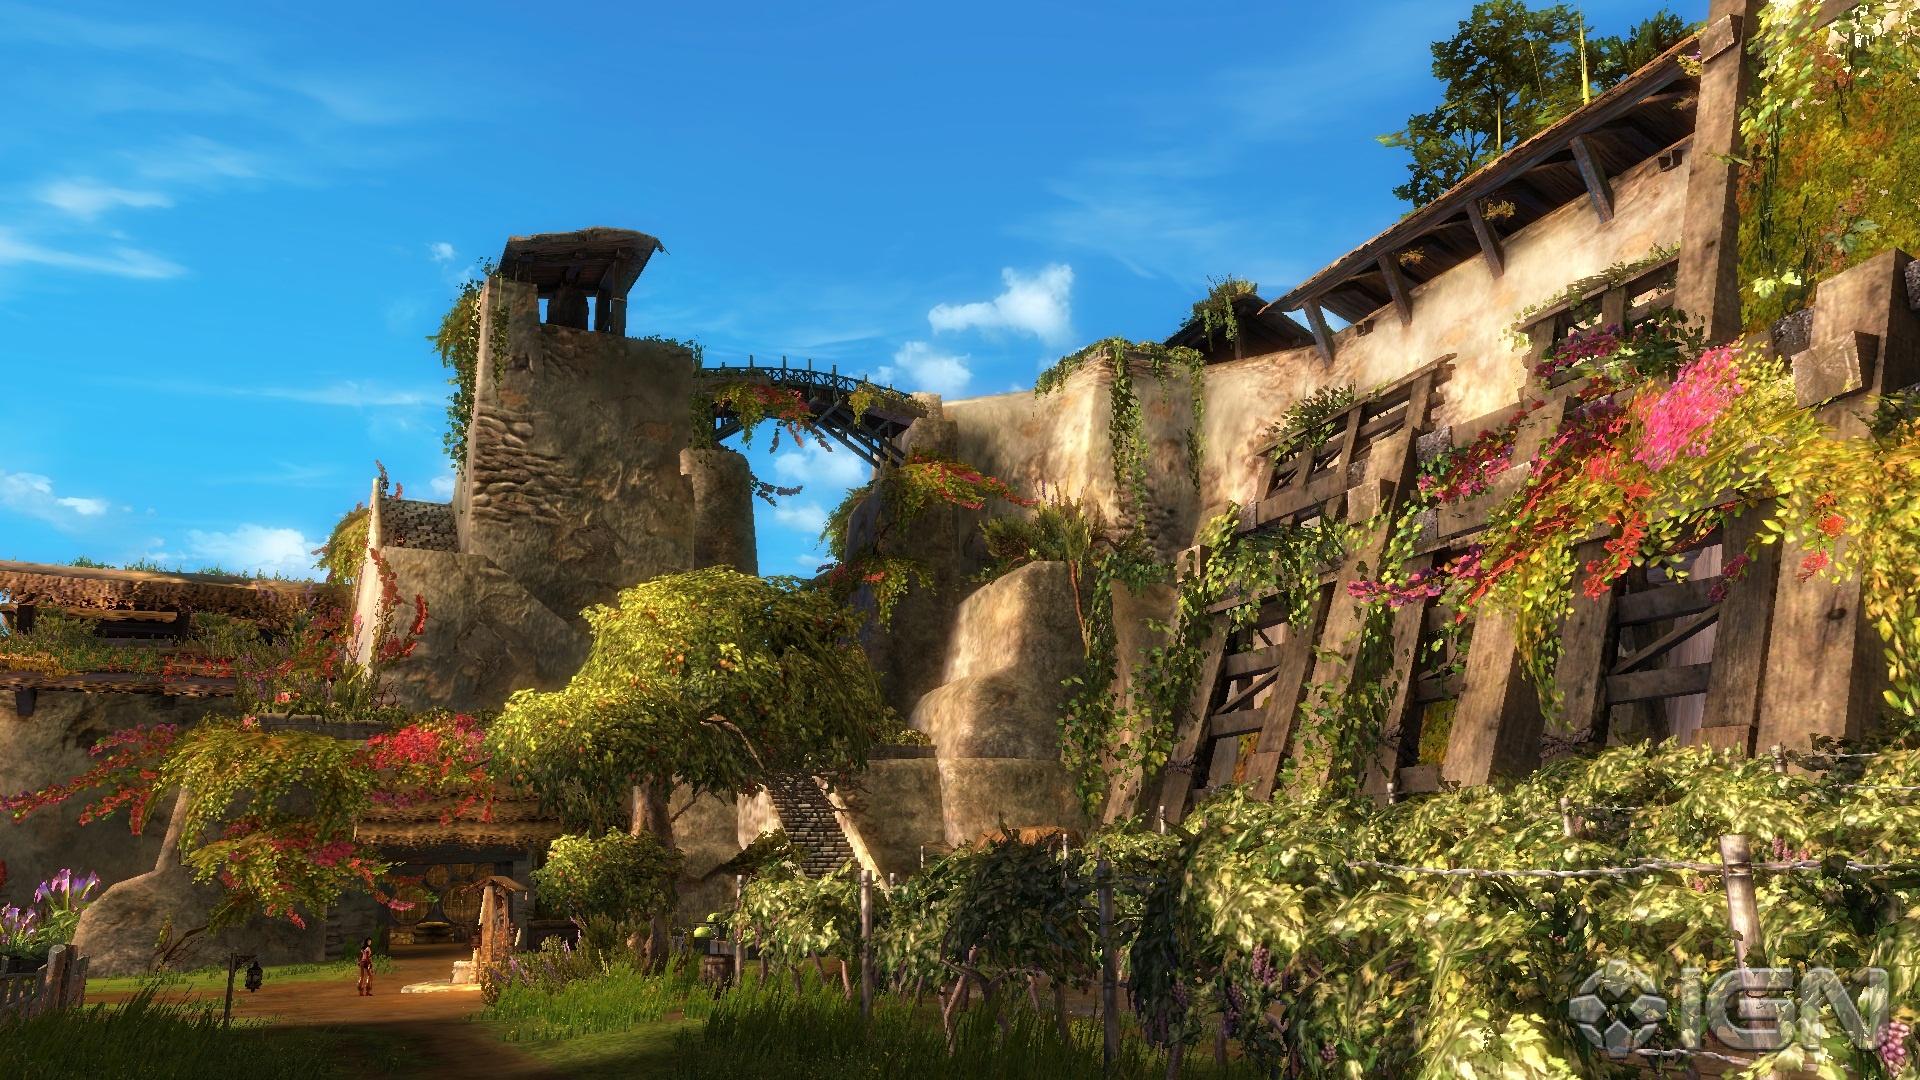 Guild Wars 2 Key (Digital Deluxe Edition) Screenshot 16.